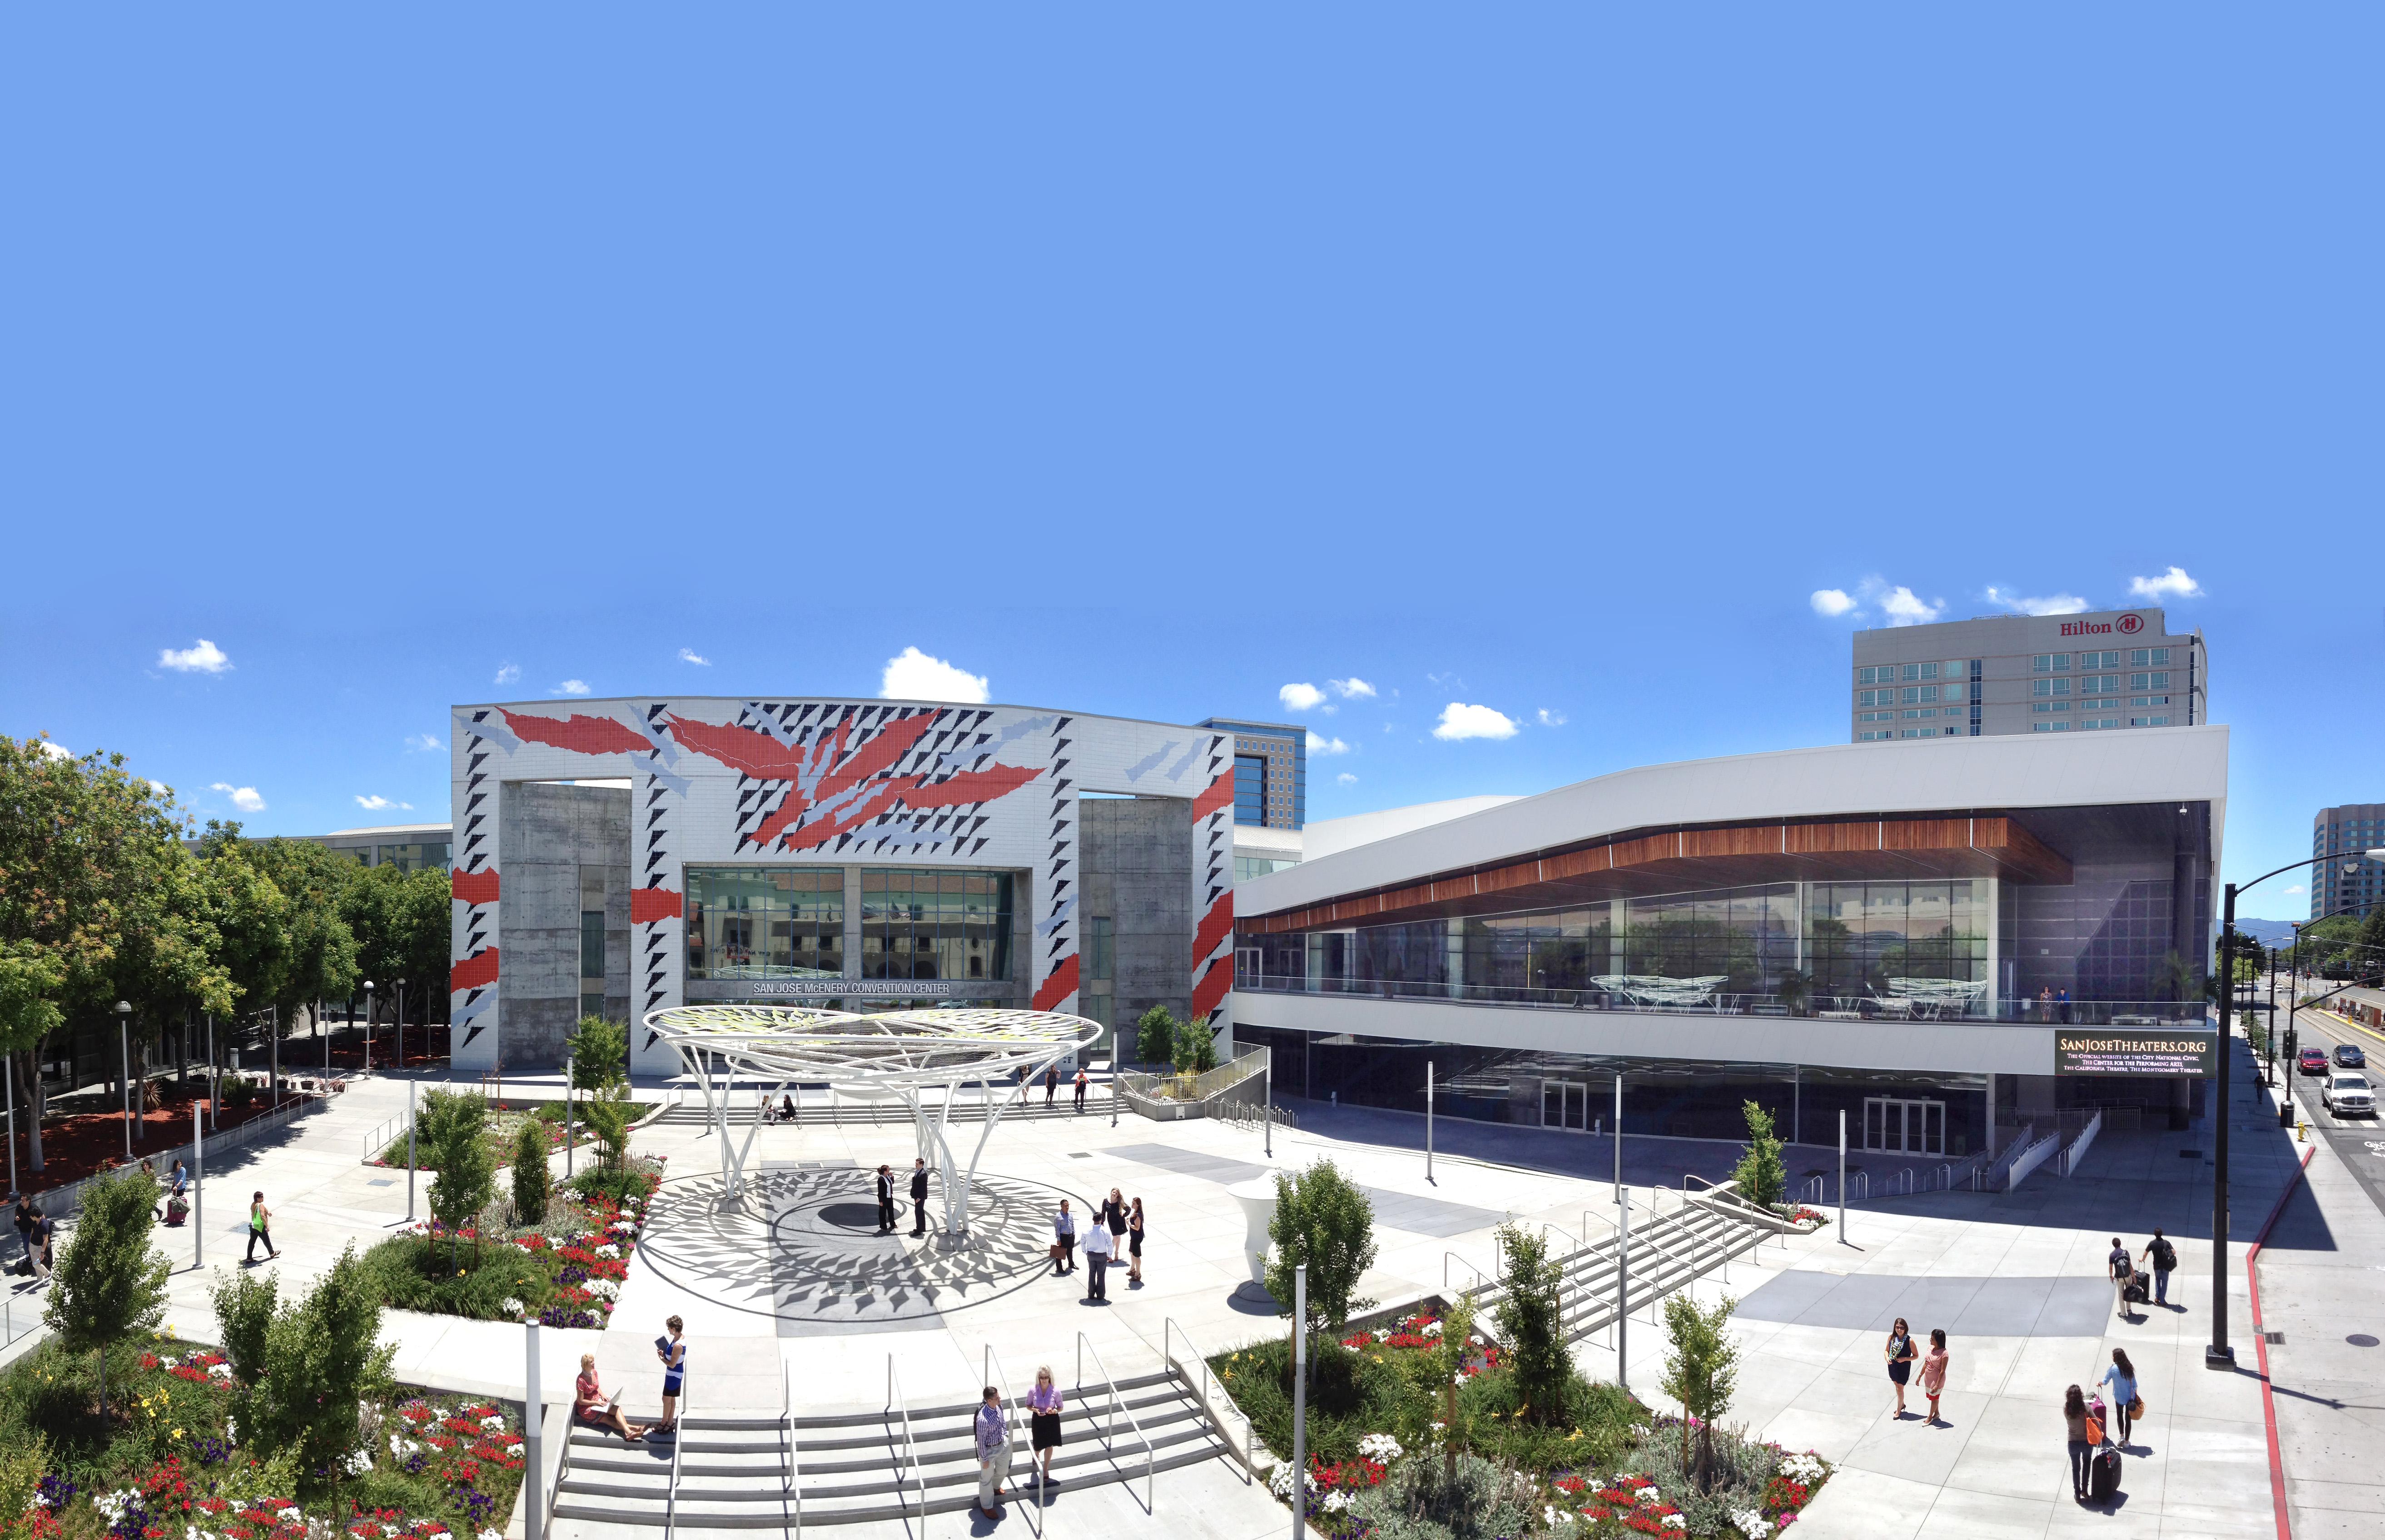 San Jose Convention Center - Wikipedia